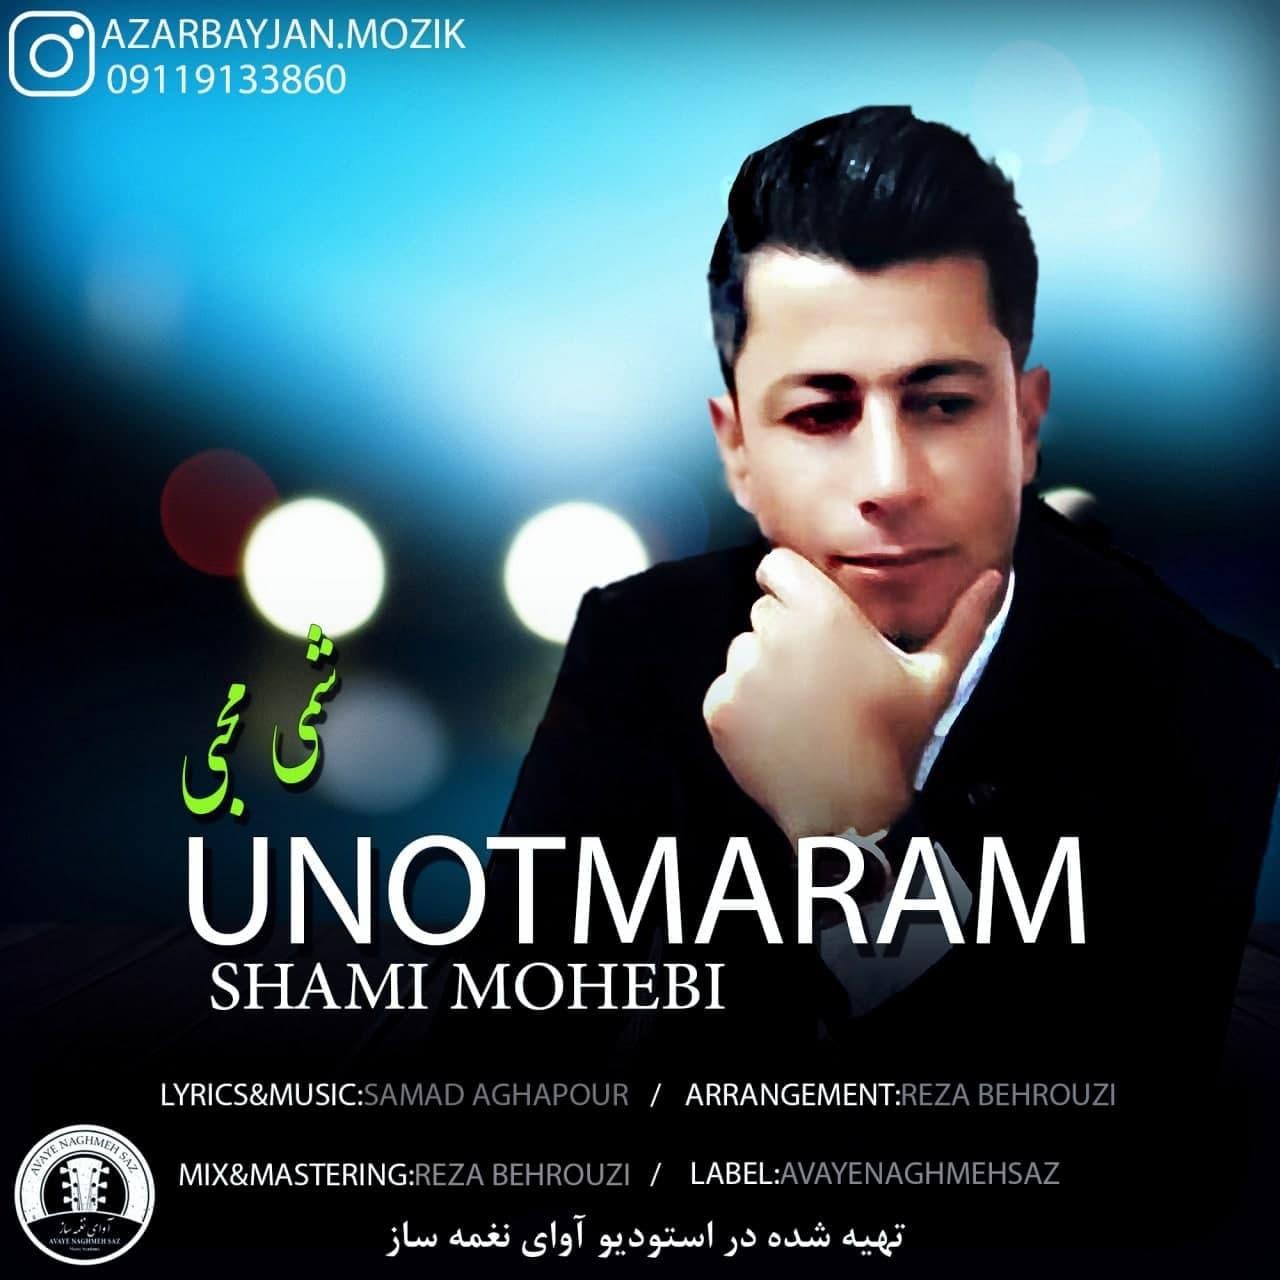 https://s18.picofile.com/file/8437183334/20Shami_Mohebi_Unotmaram.jpg